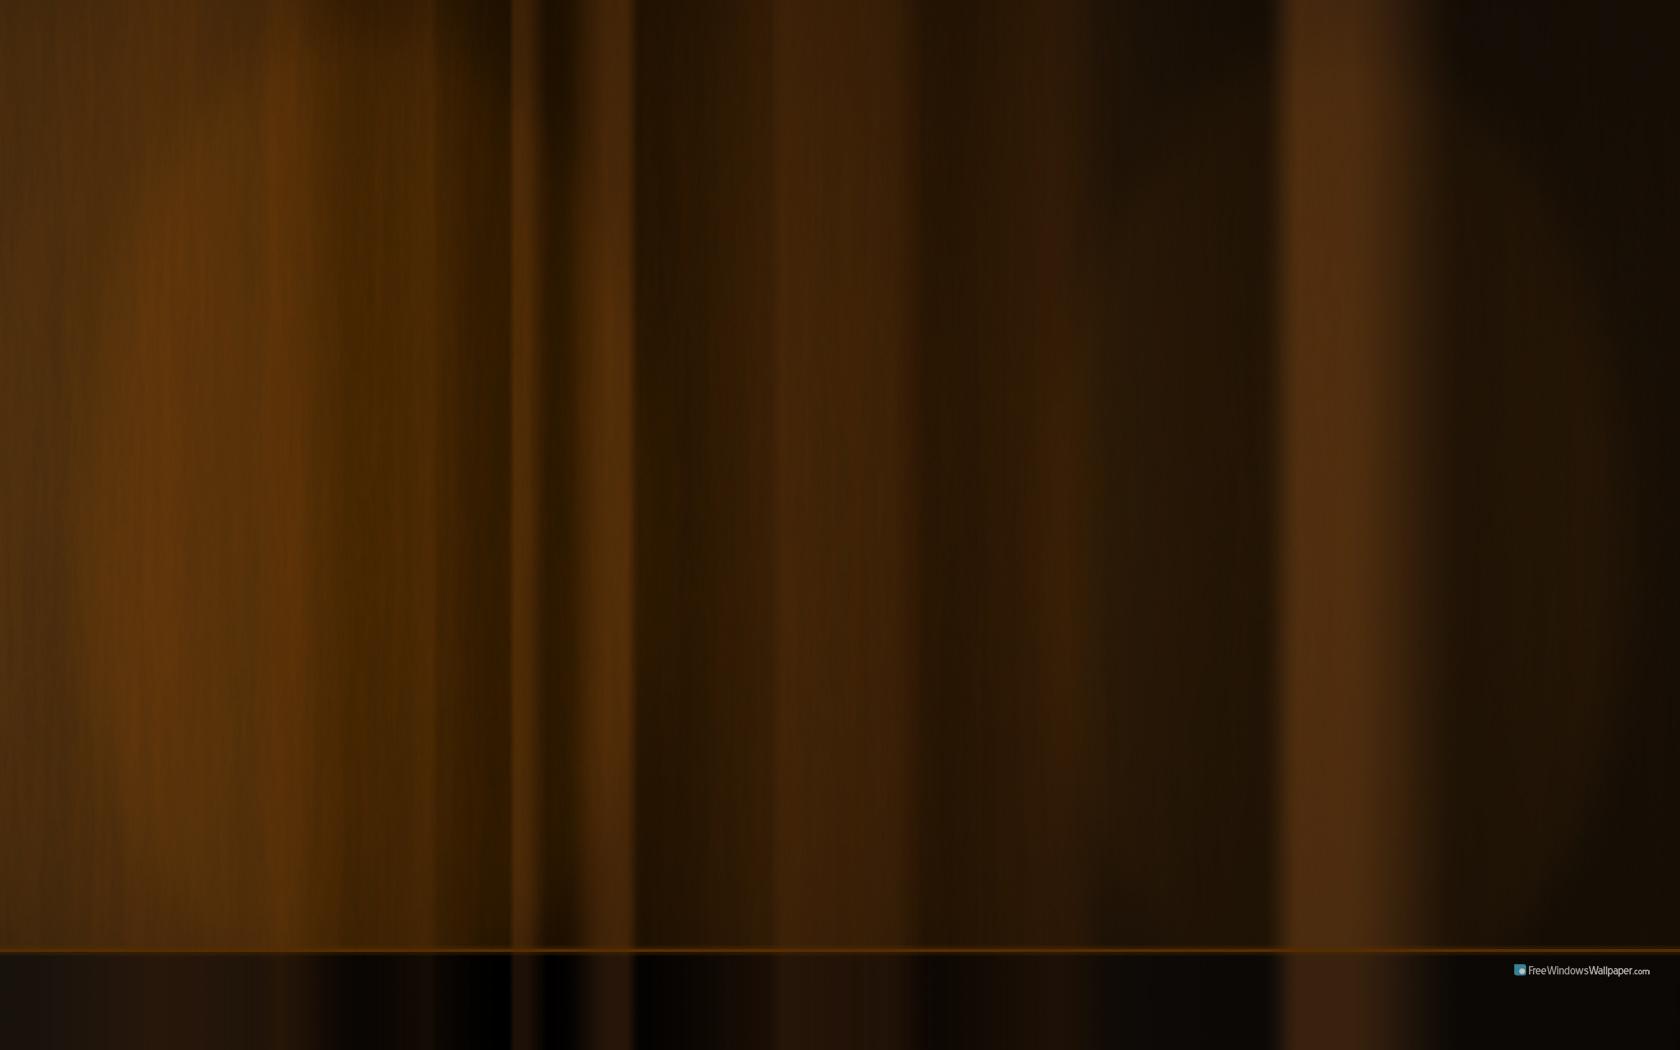 Brown wallpapers   Brown Wallpaper 2658869 1680x1050